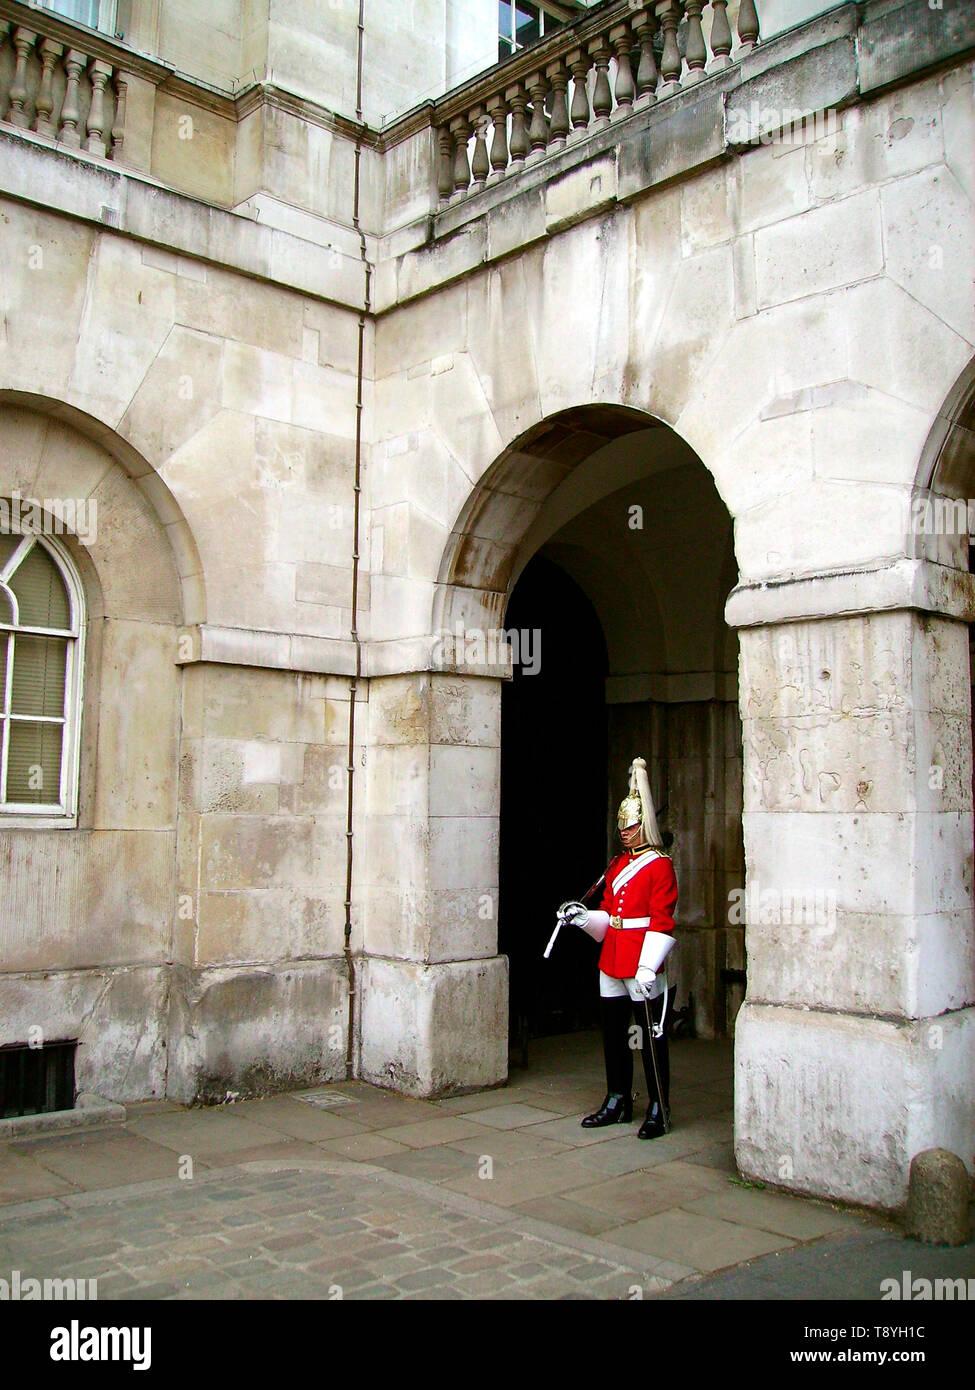 Guard on duty, London, UK - Stock Image